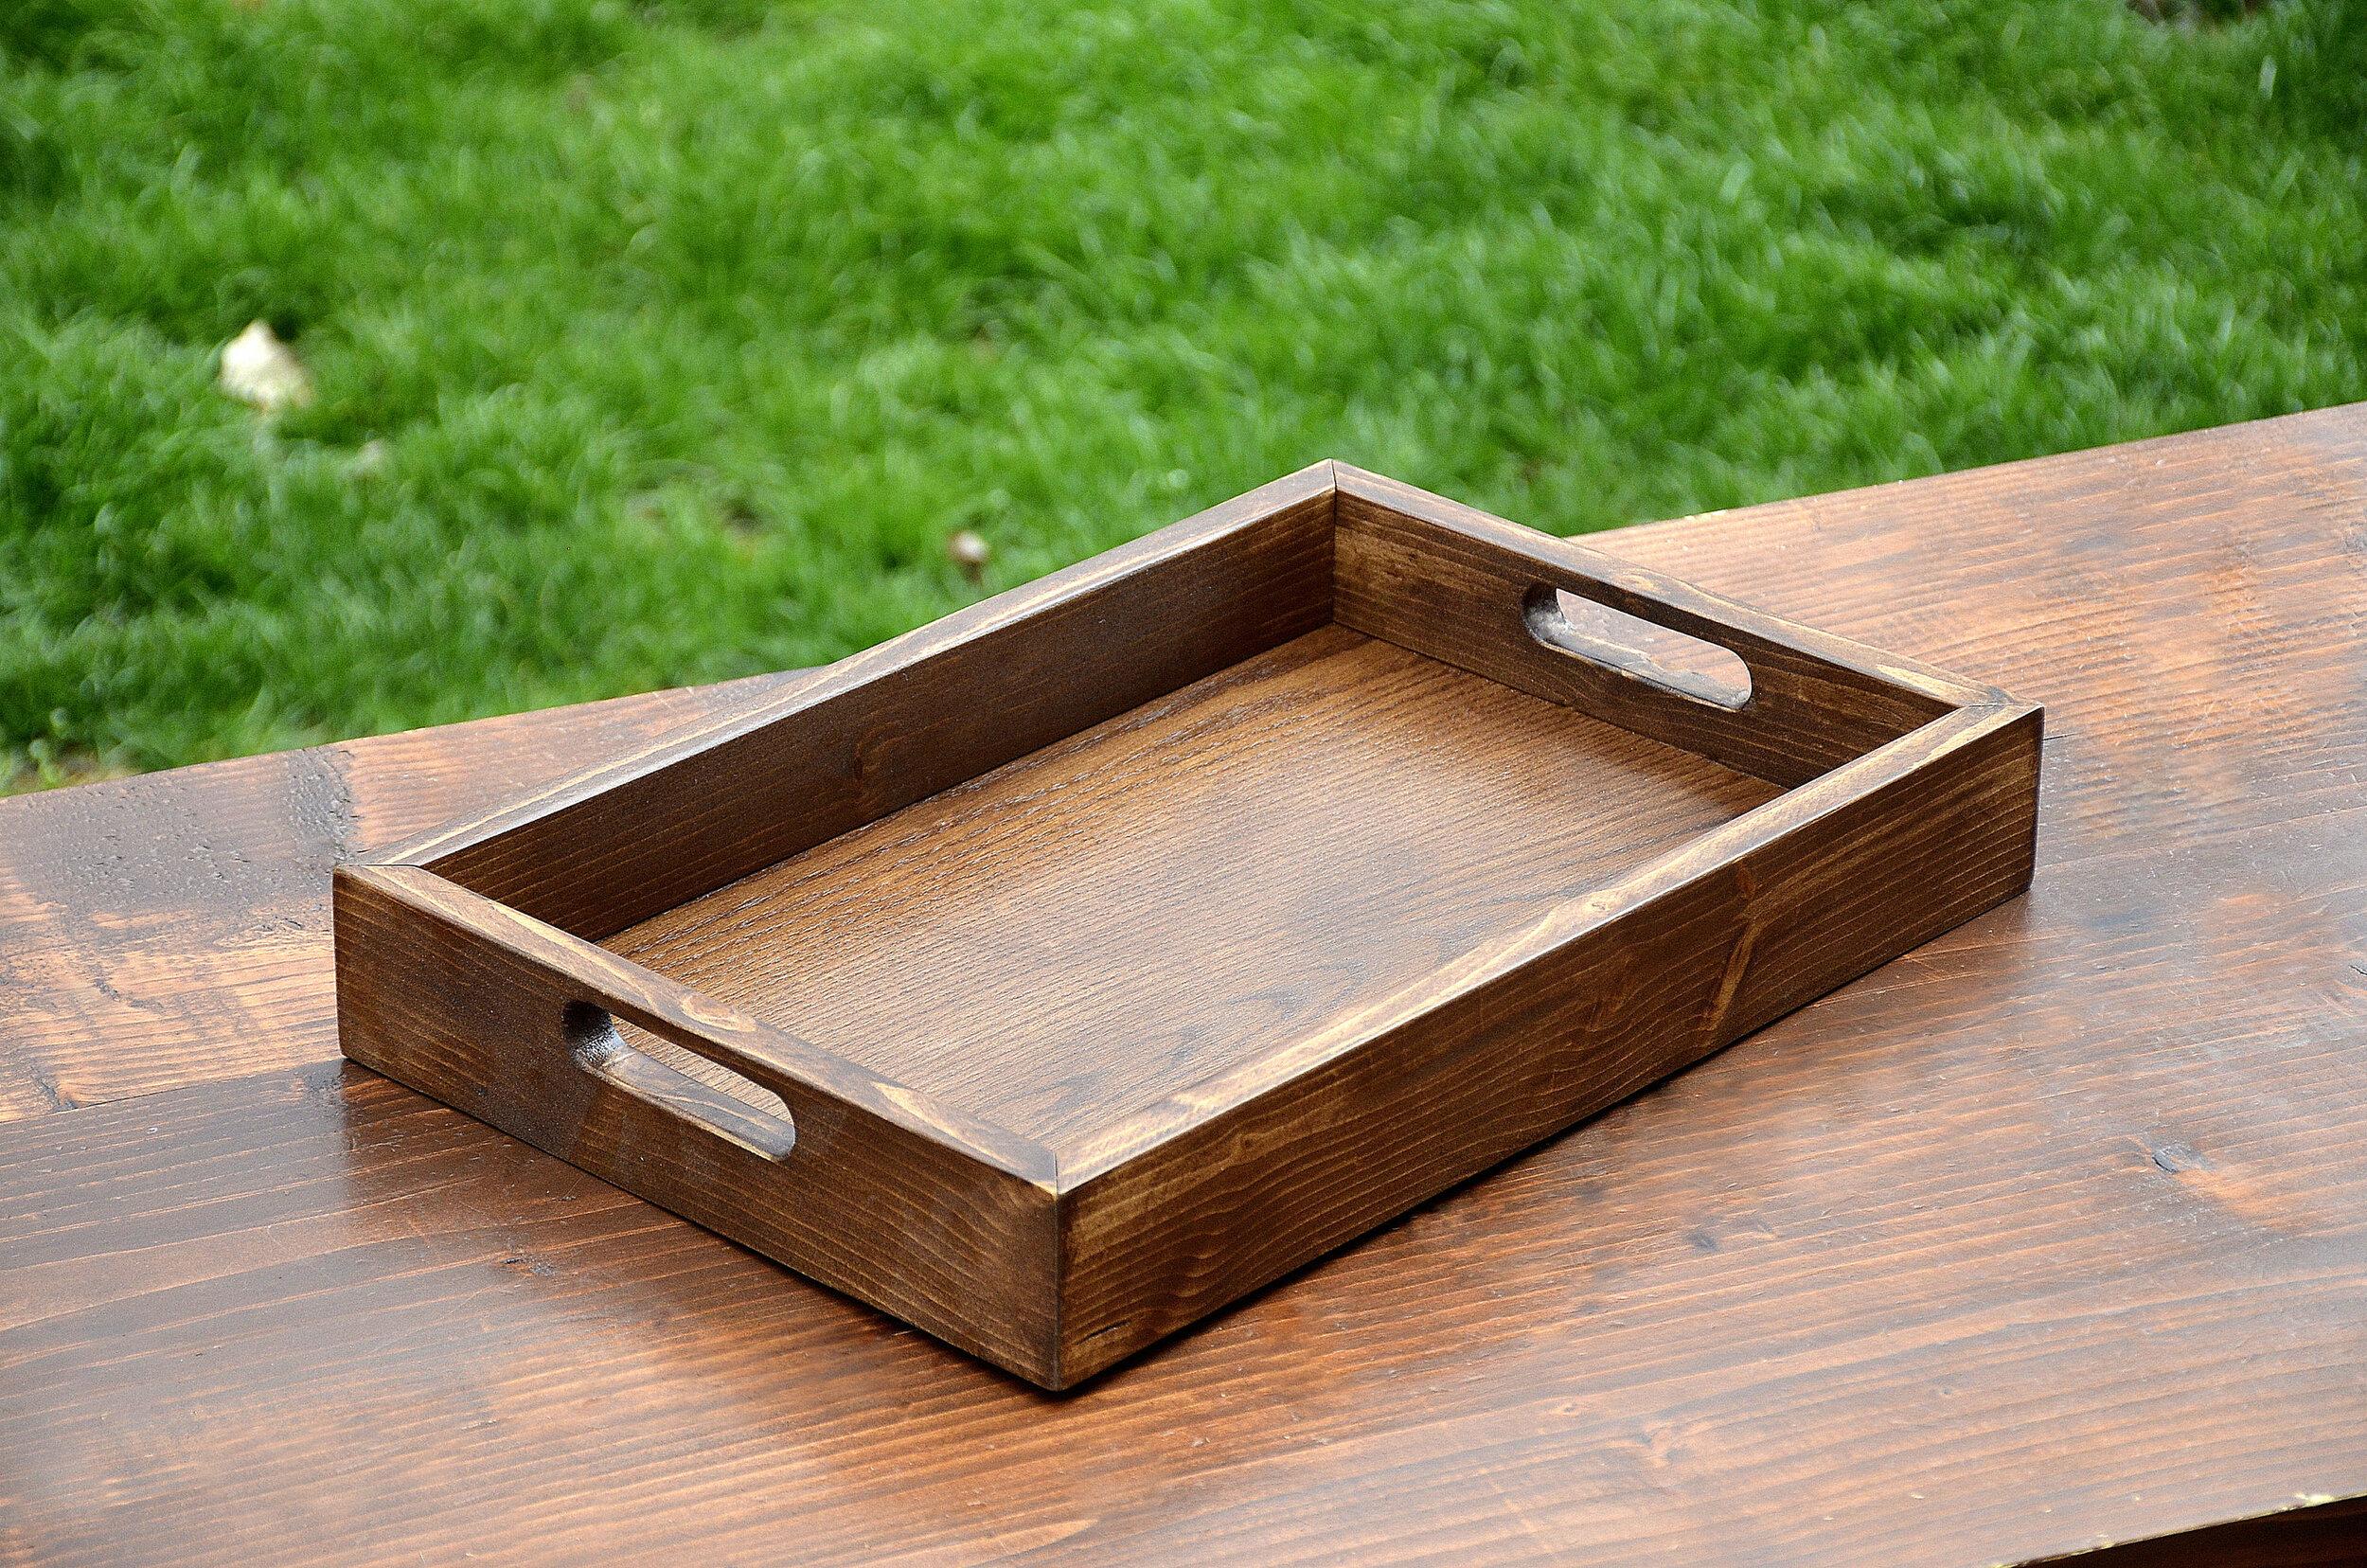 Wood Tray Serving Coffee Table Ottoman Penn Rustics